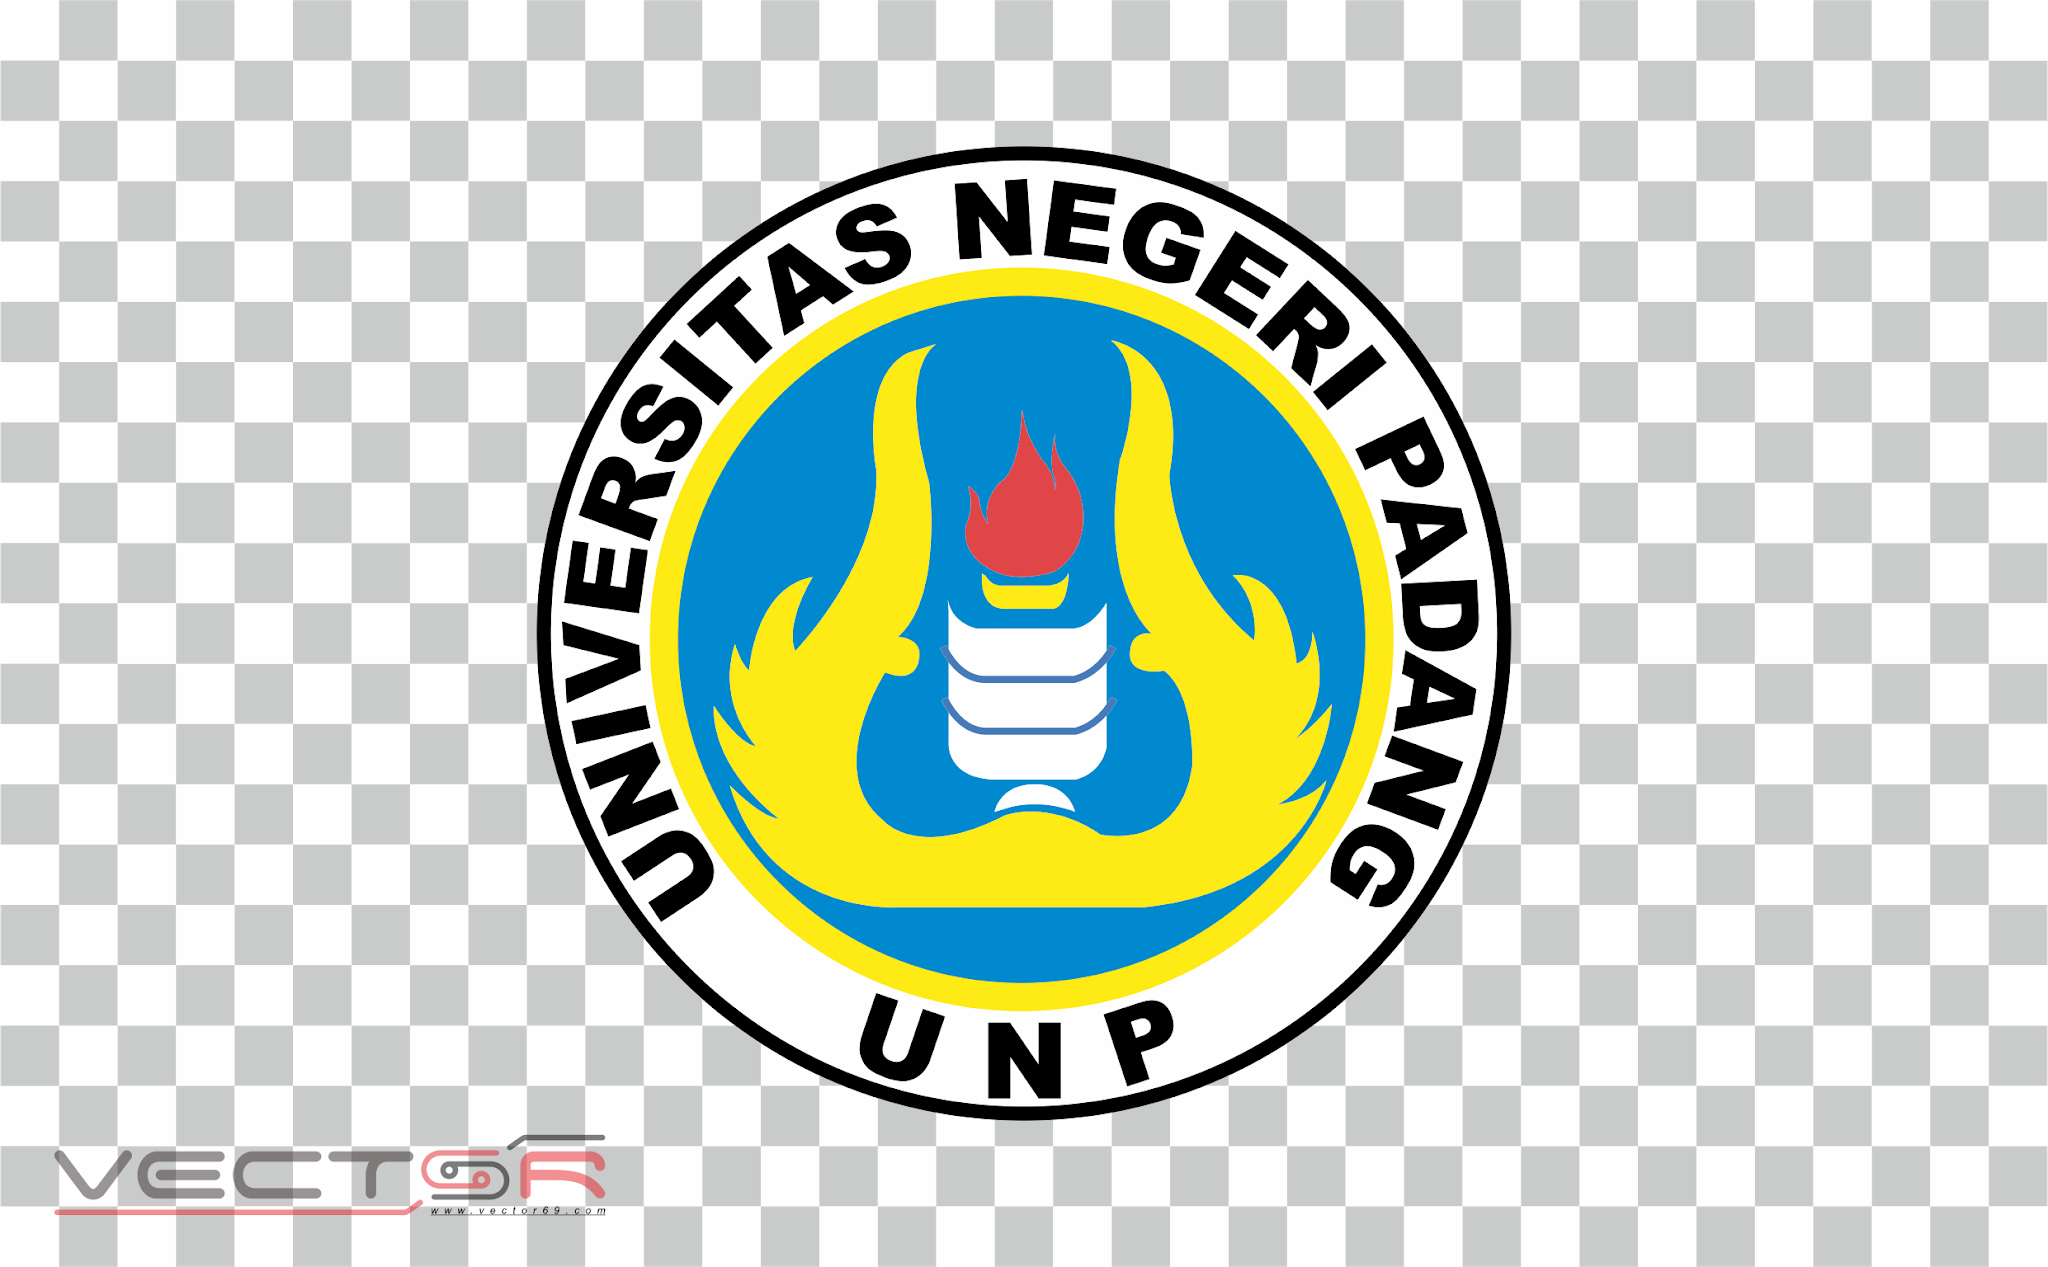 Logo UNP (Universitas Negeri Padang) - Download .PNG (Portable Network Graphics) Transparent Images